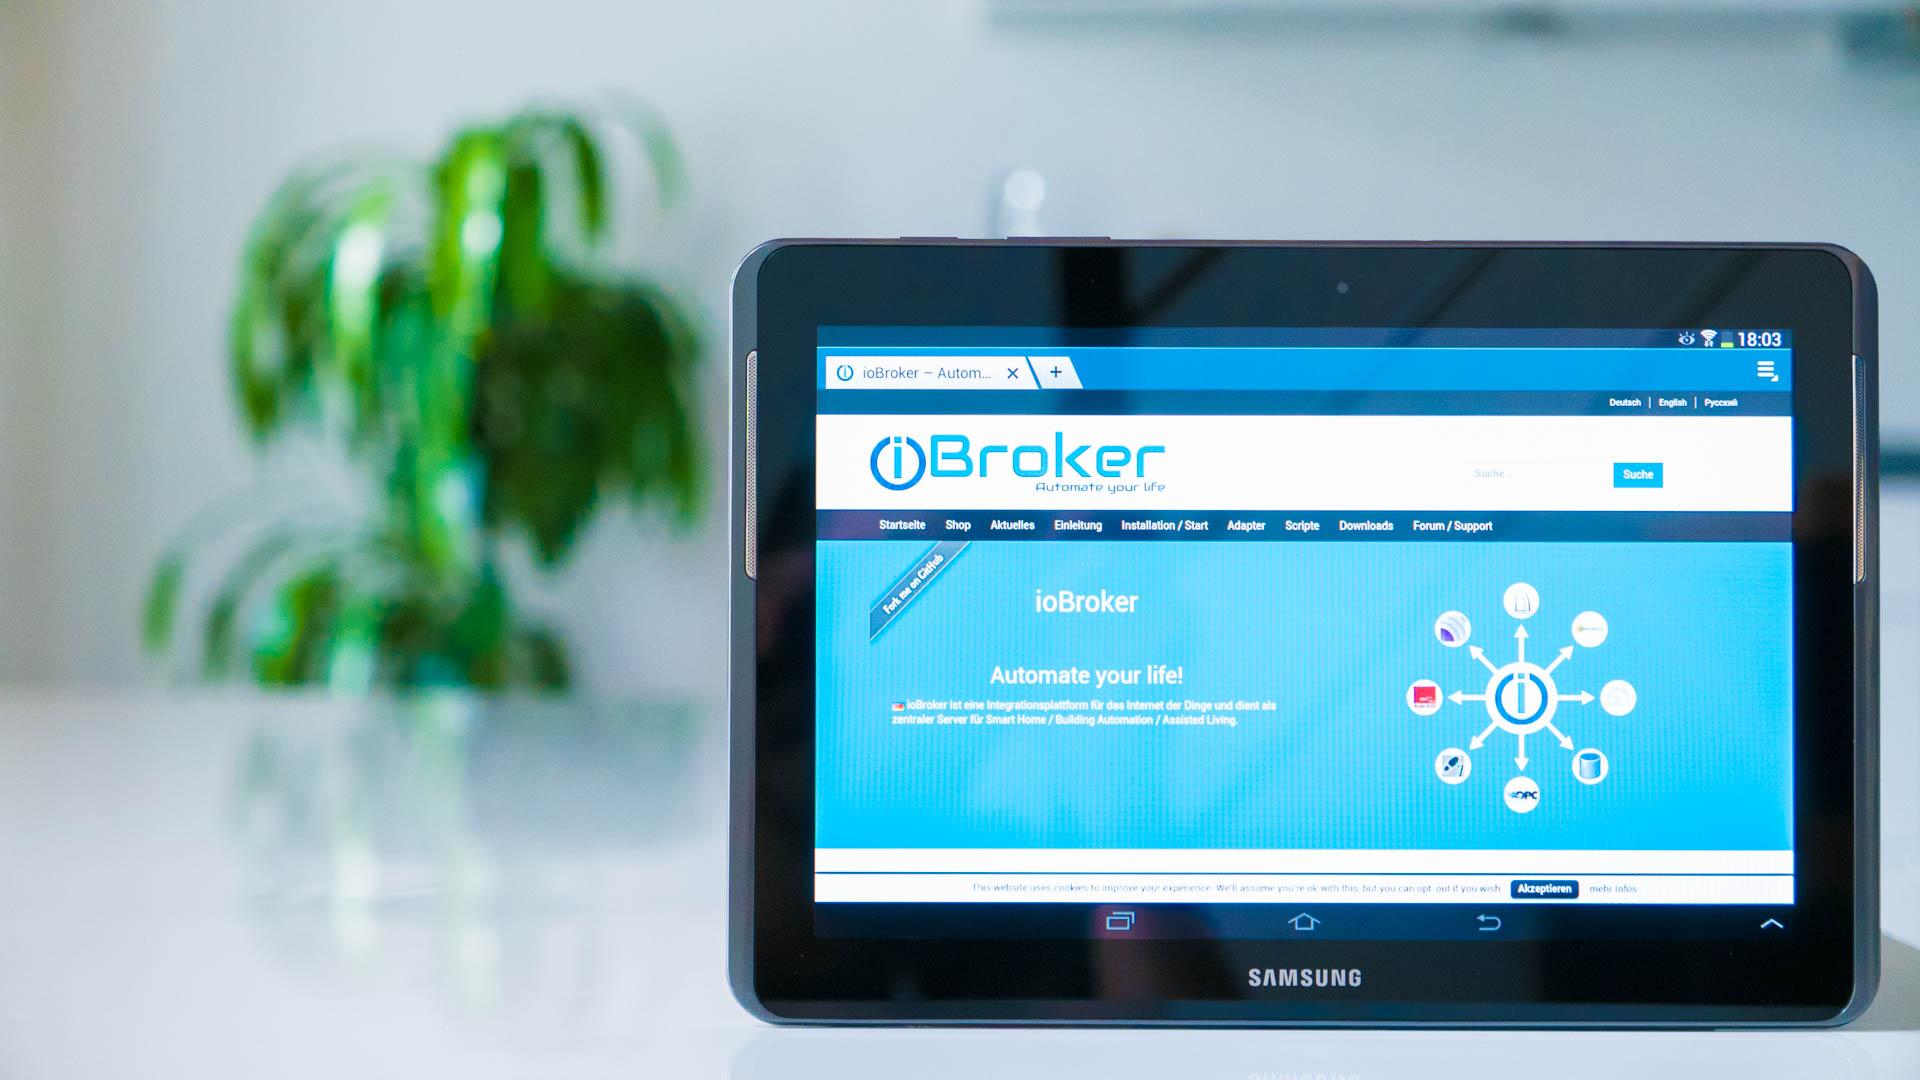 ioBroker Philips hue Integration – smarthome